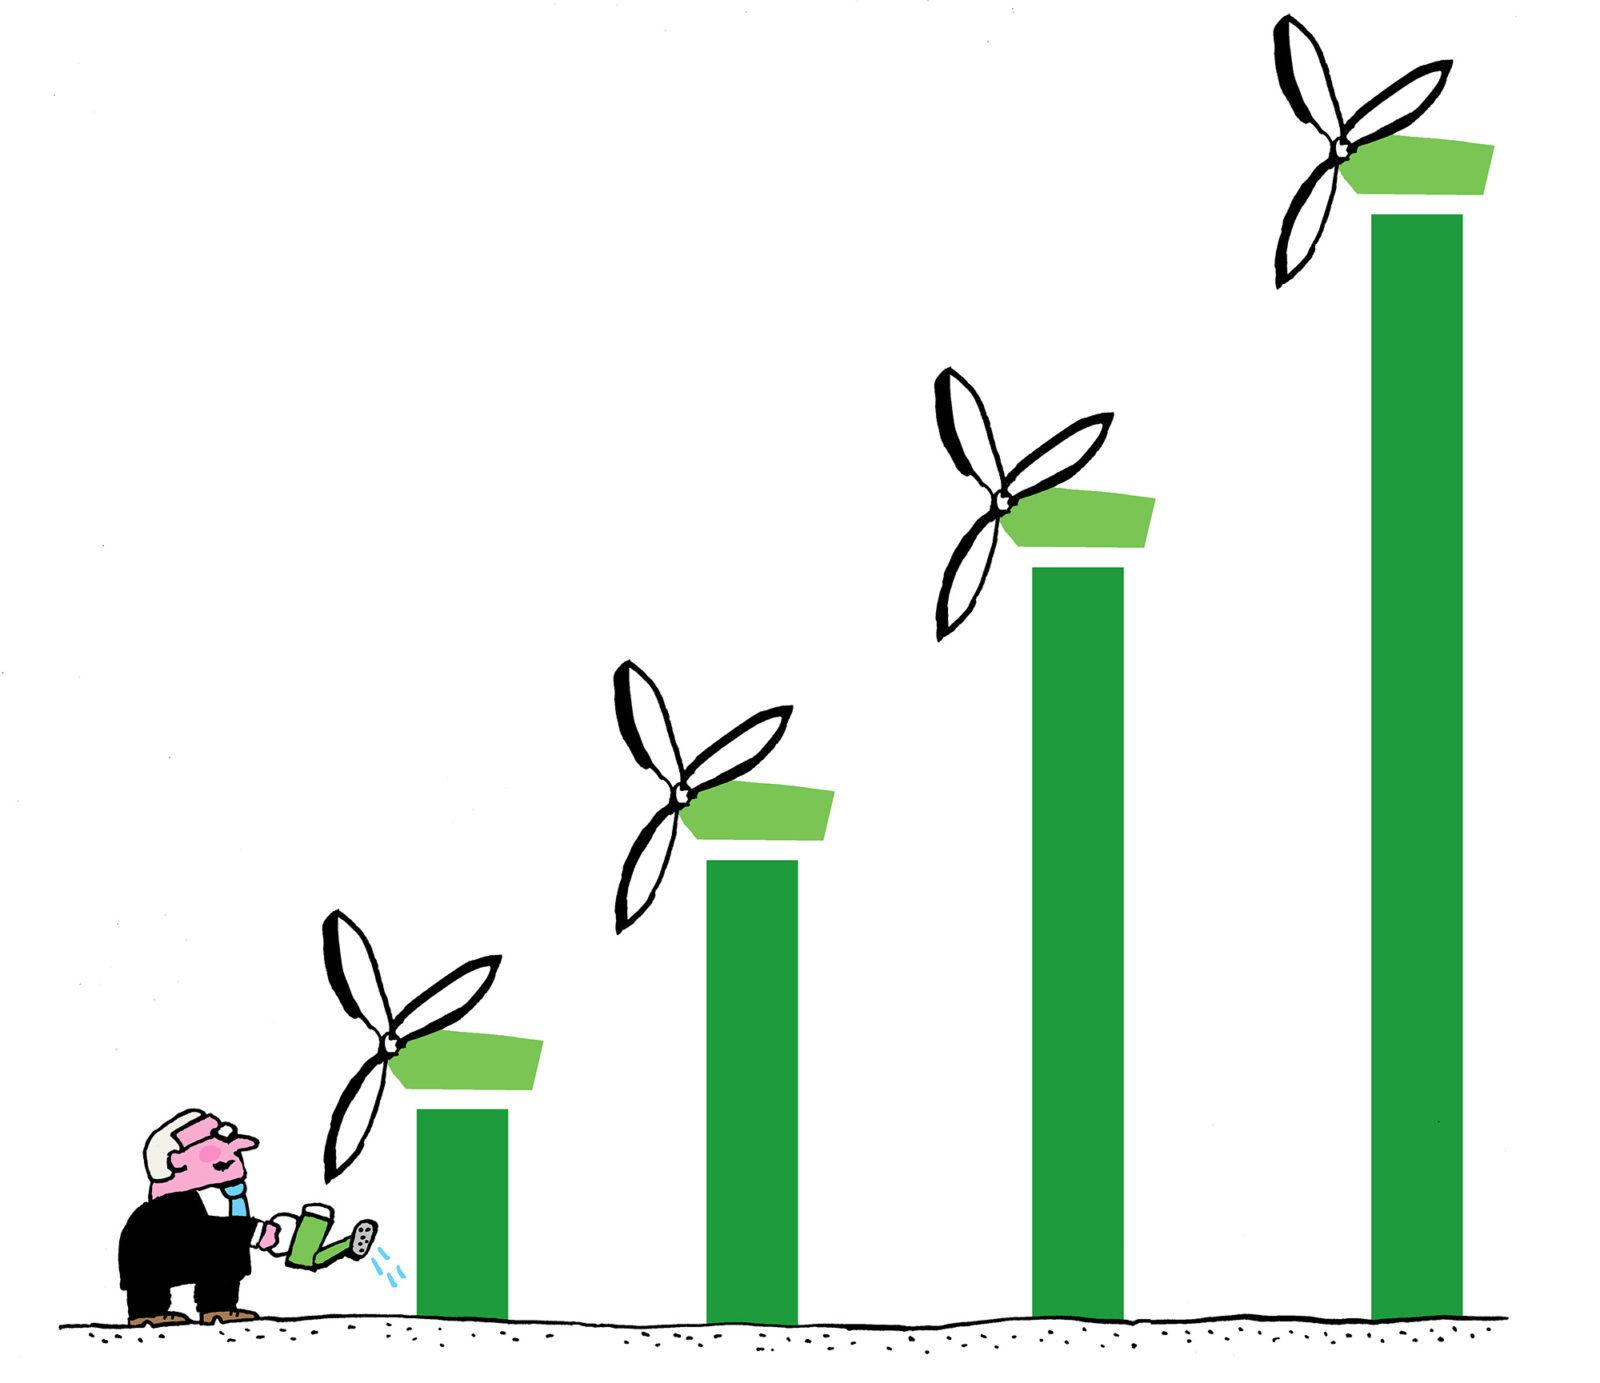 kwestie-duurzamer-monetair-beleid-windmolens-bas-van-der-schot